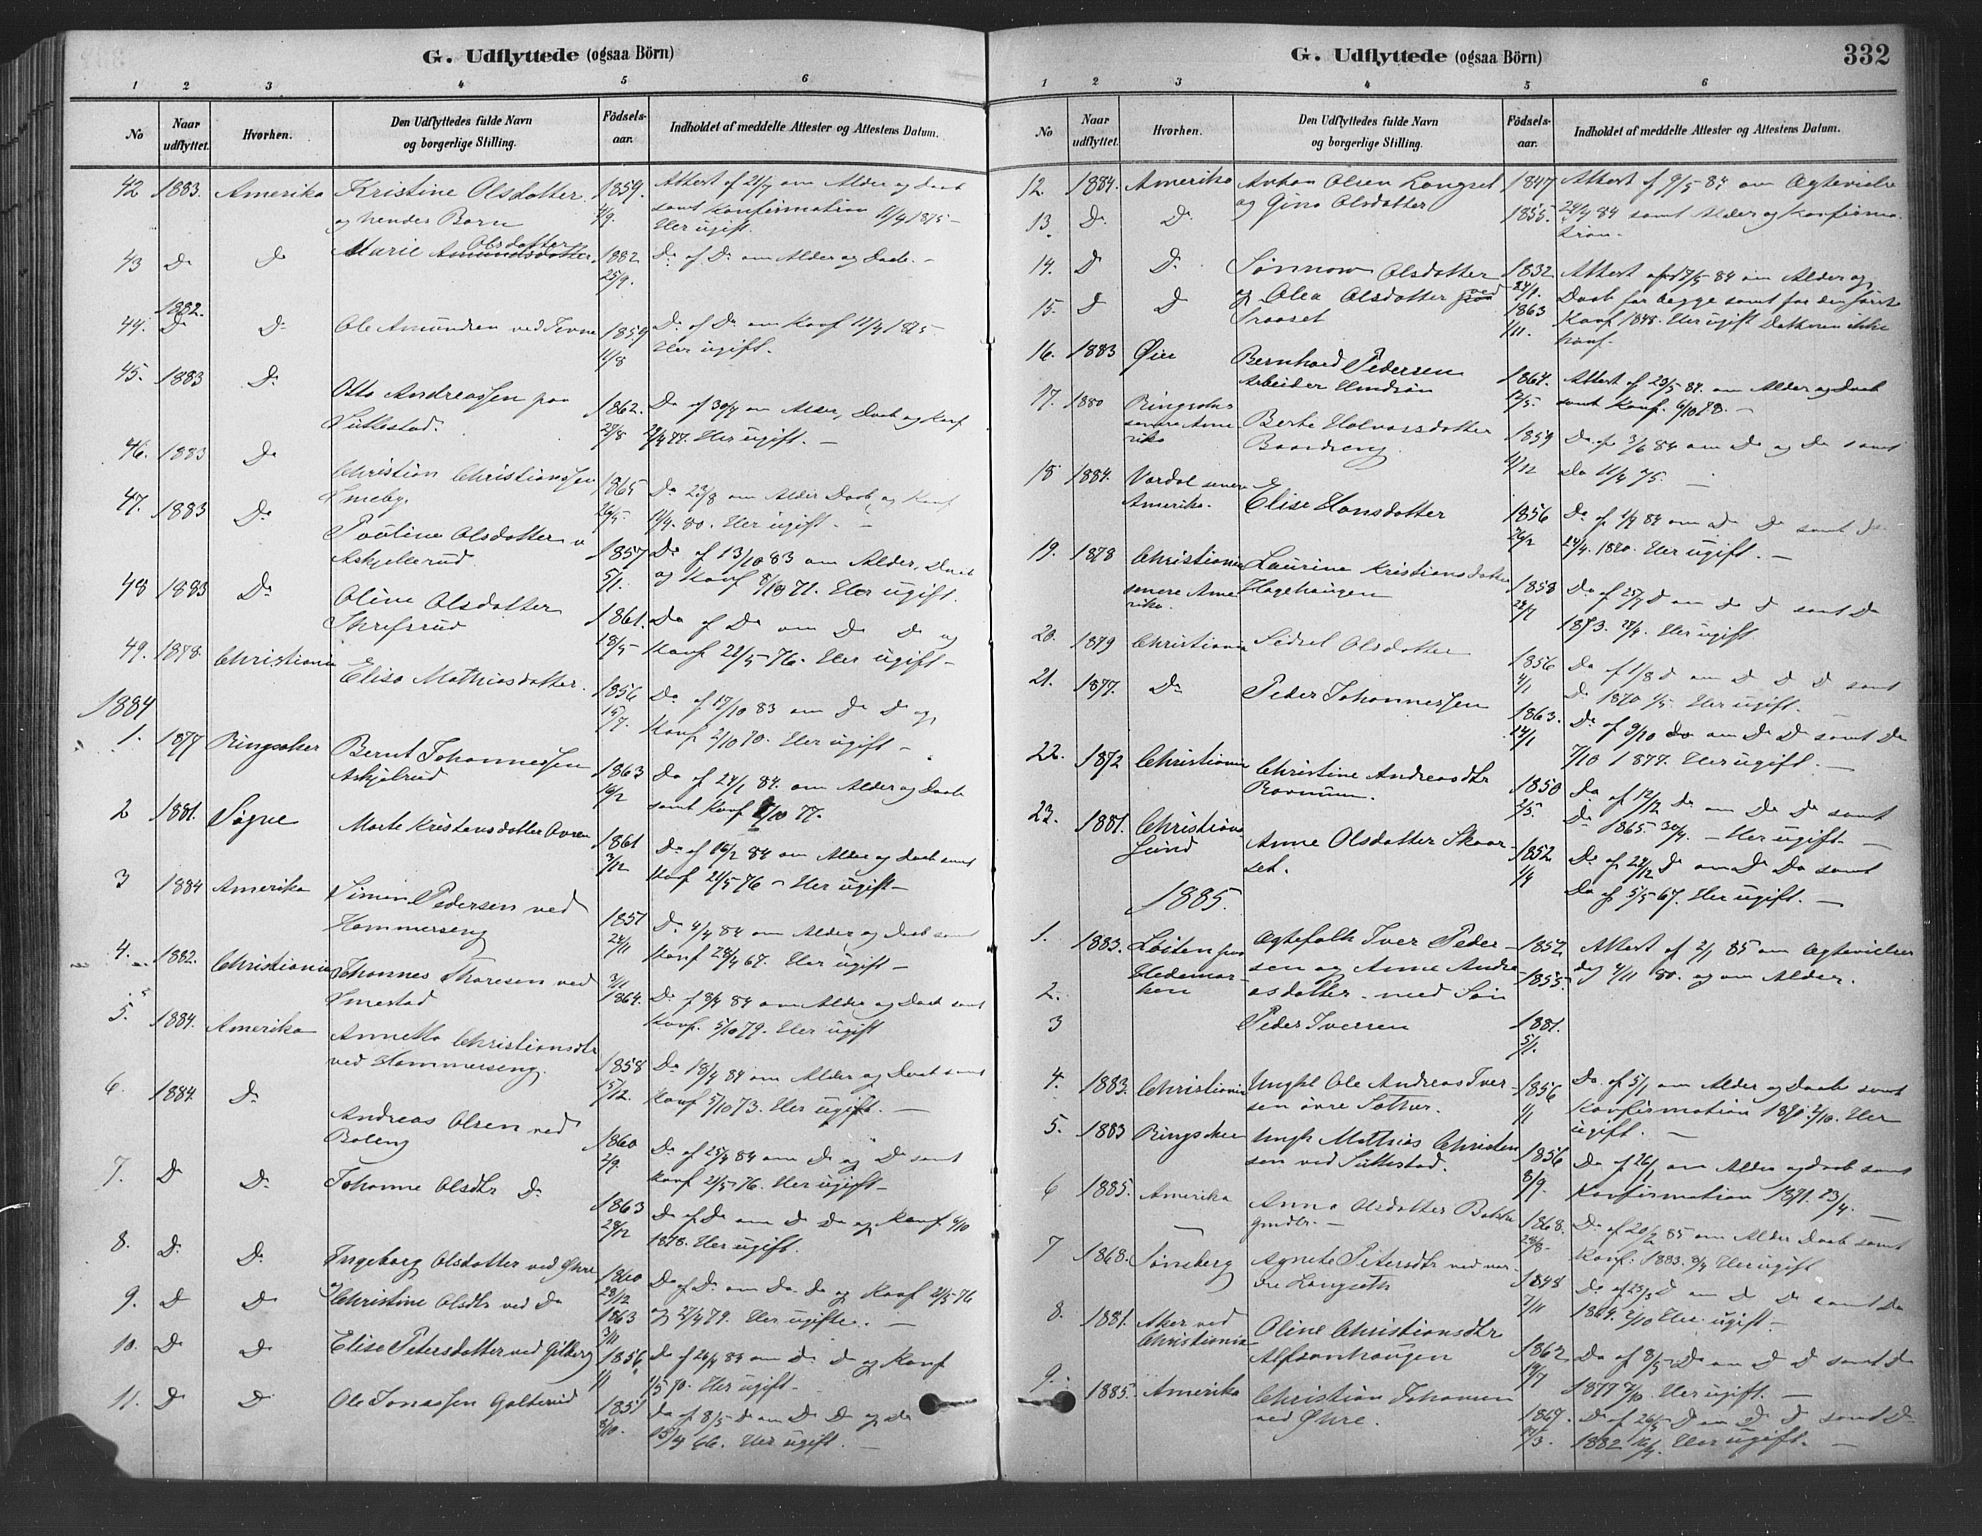 SAH, Fåberg prestekontor, Ministerialbok nr. 9, 1879-1898, s. 332